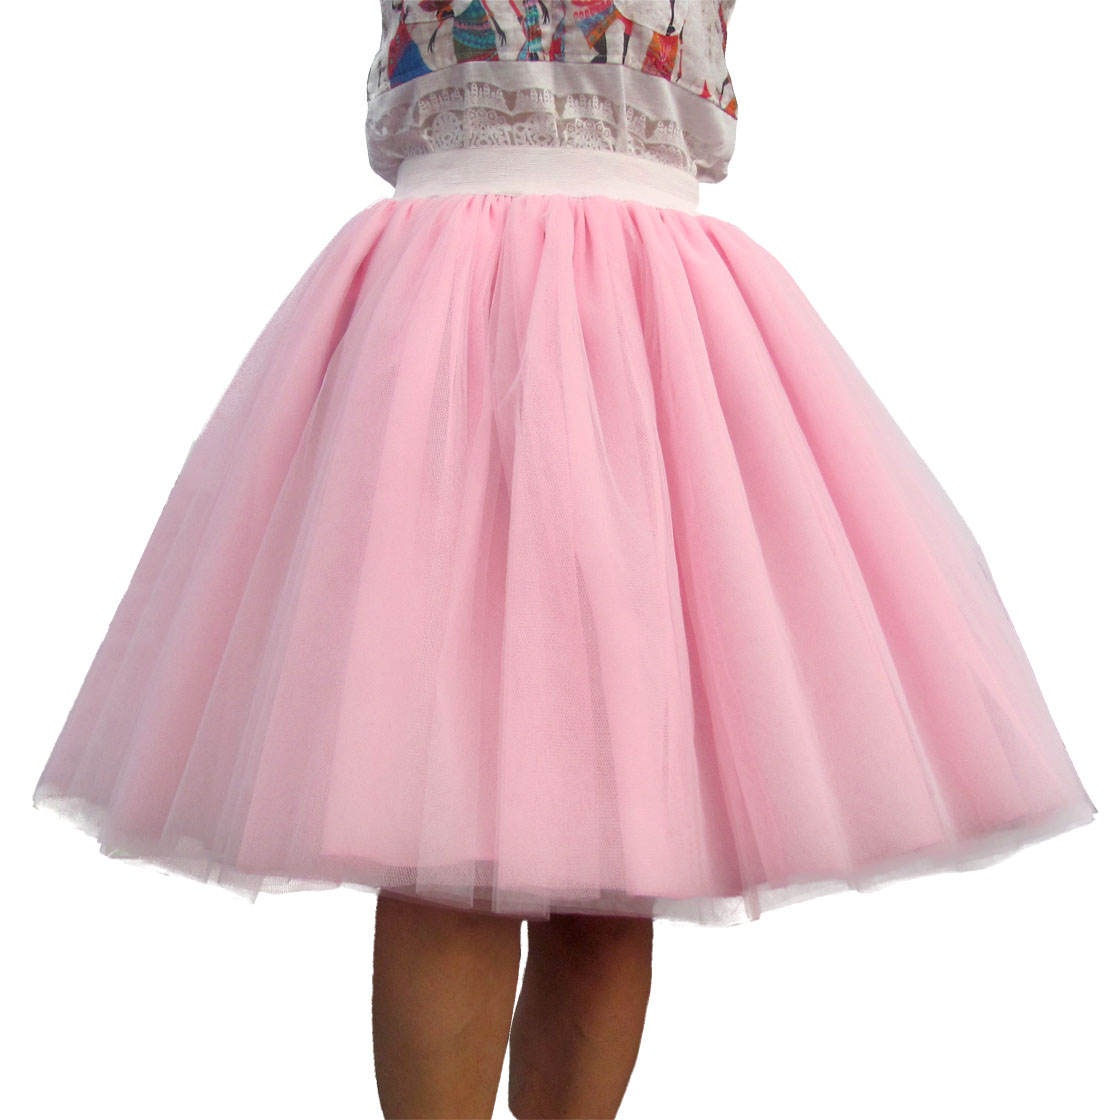 1b1a0fb09d Custom Made Women Tulle Skirt 6 Layer of White Pink Black Ball Gown High  waist falda